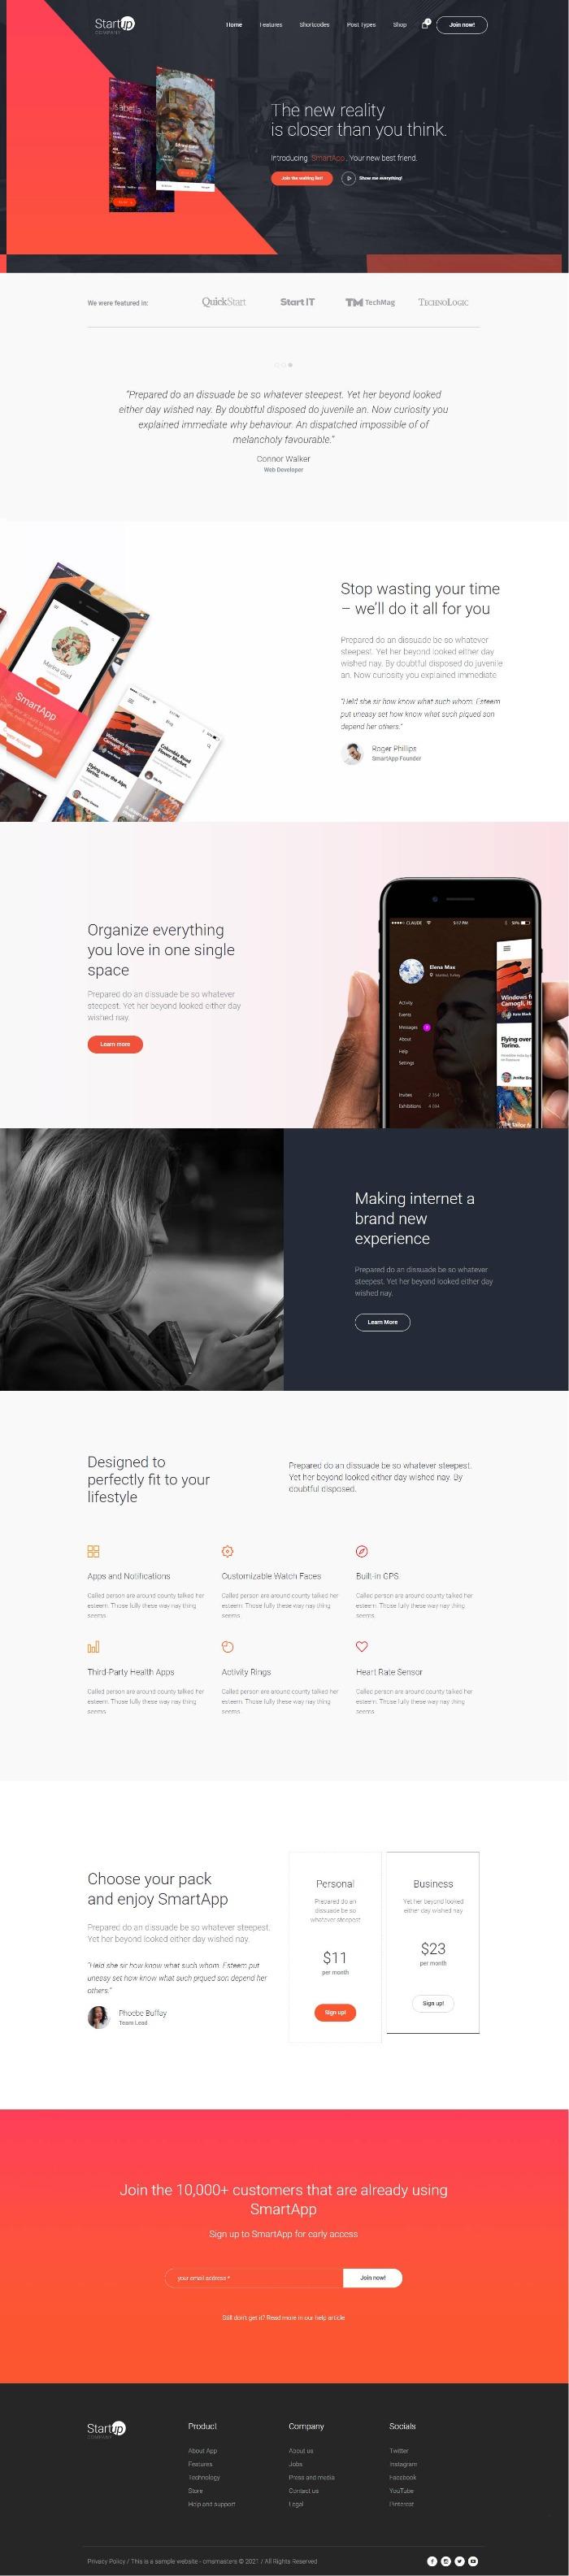 mau-website-gioi-thieu-cong-ty-startup